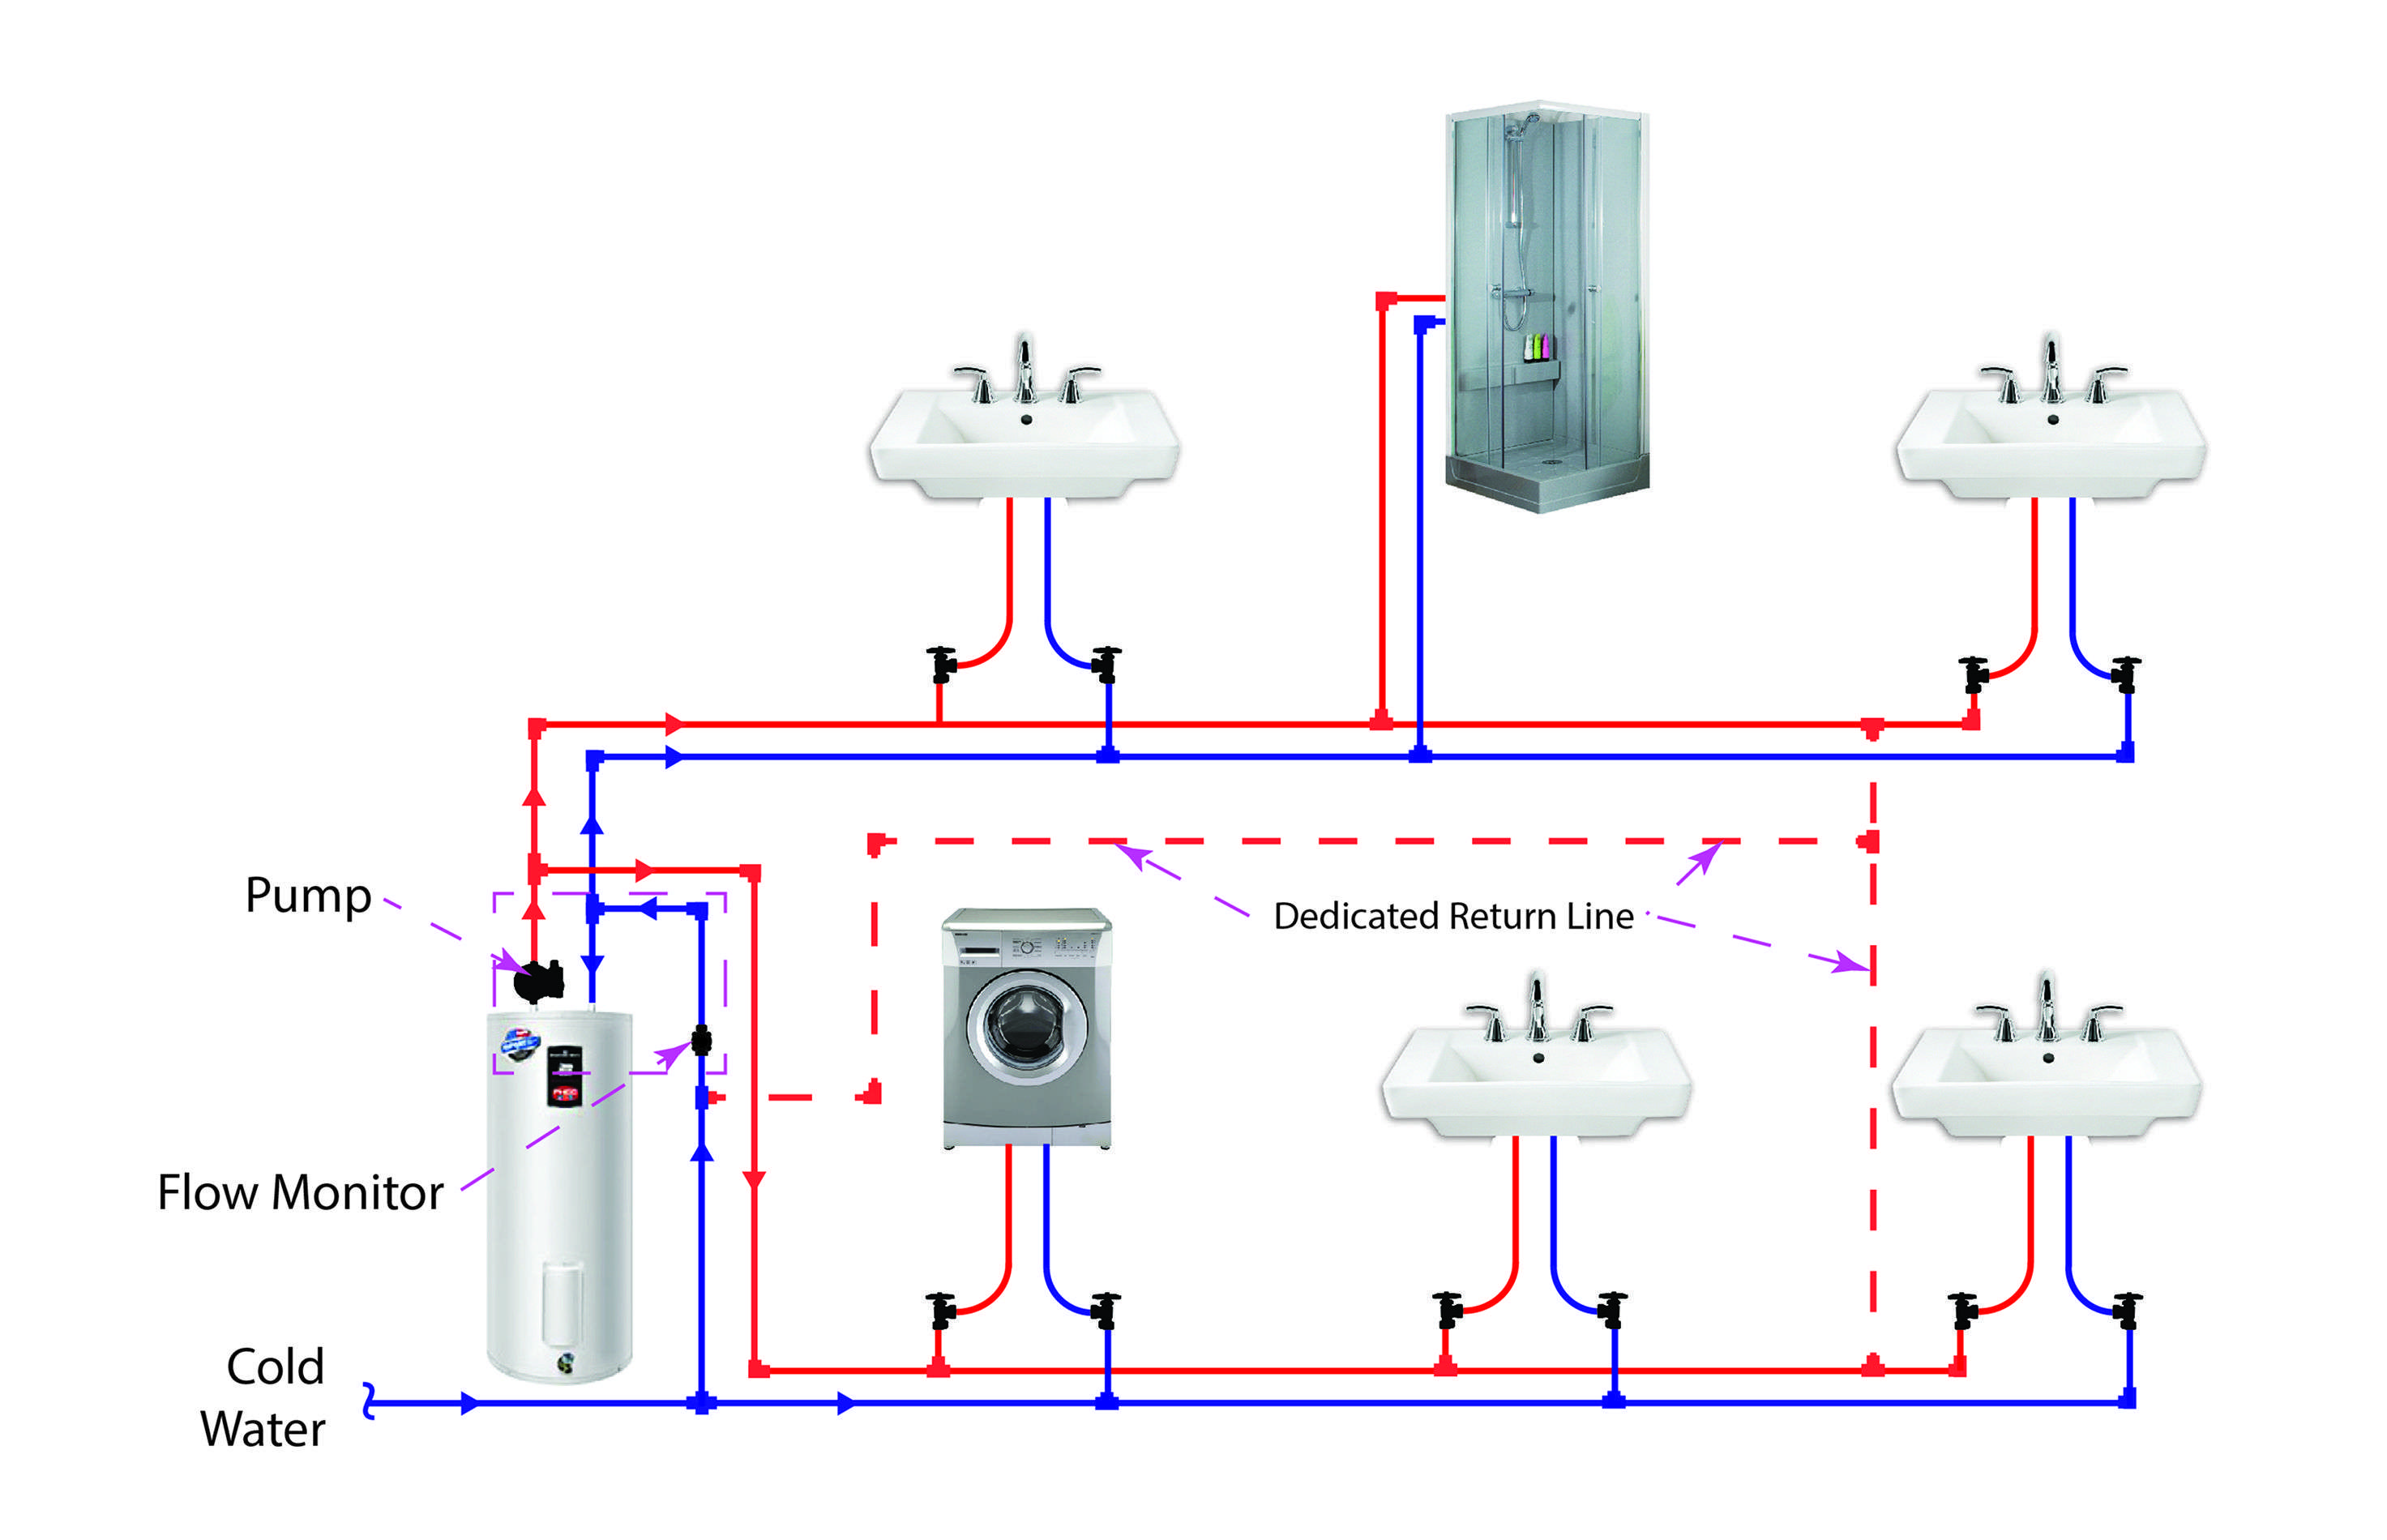 Dedicated Hot Water Circulation Loop Line